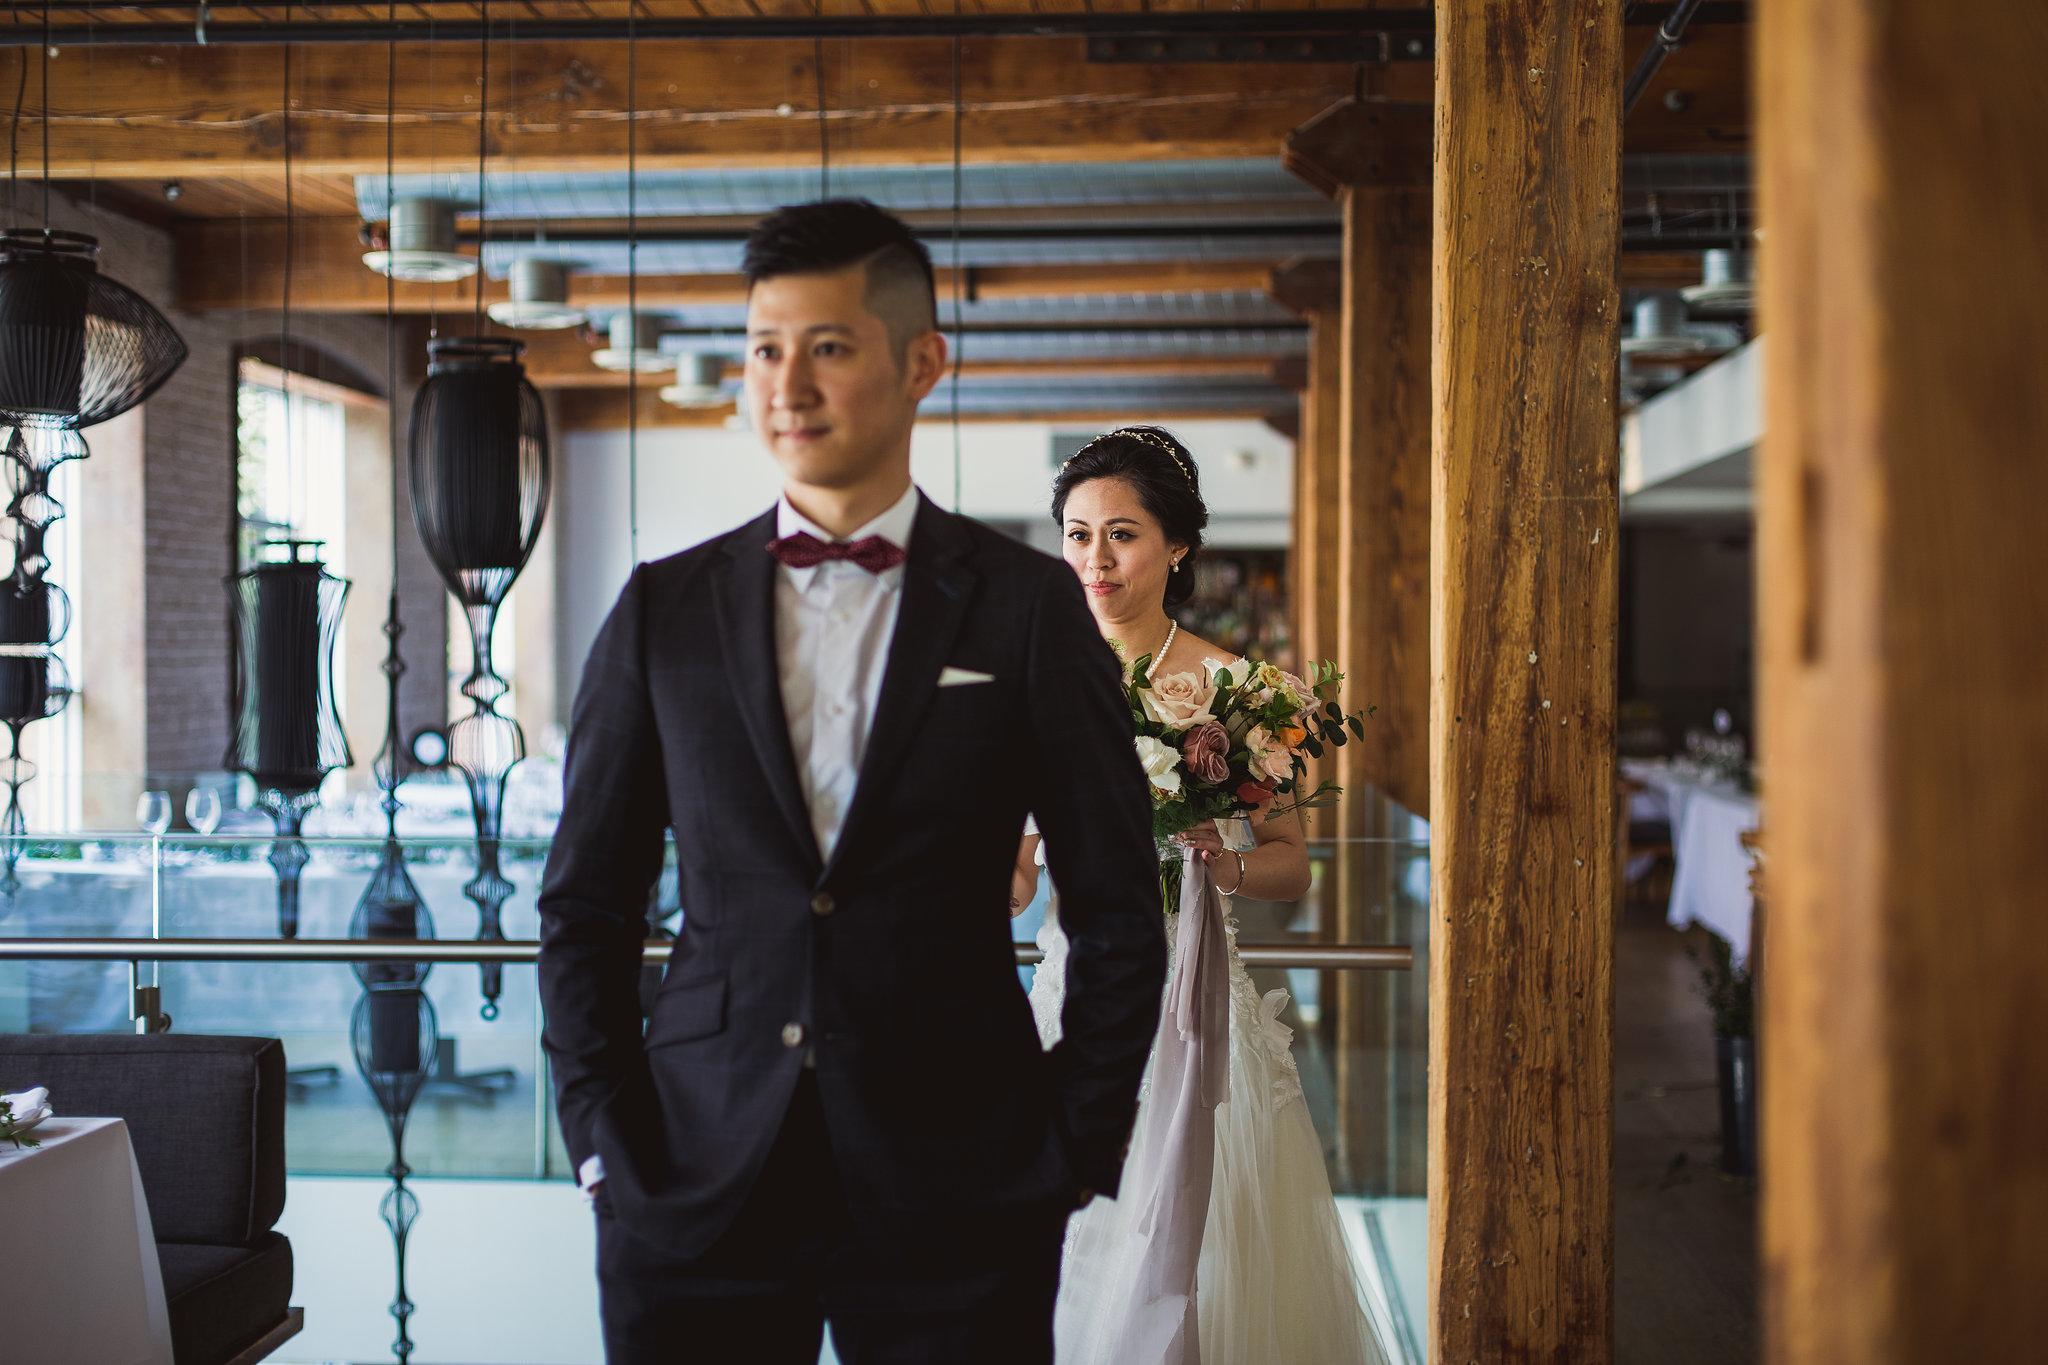 Jessica Jason Hotel Ocho Wedding Photos 149 - Hotel Ocho Wedding